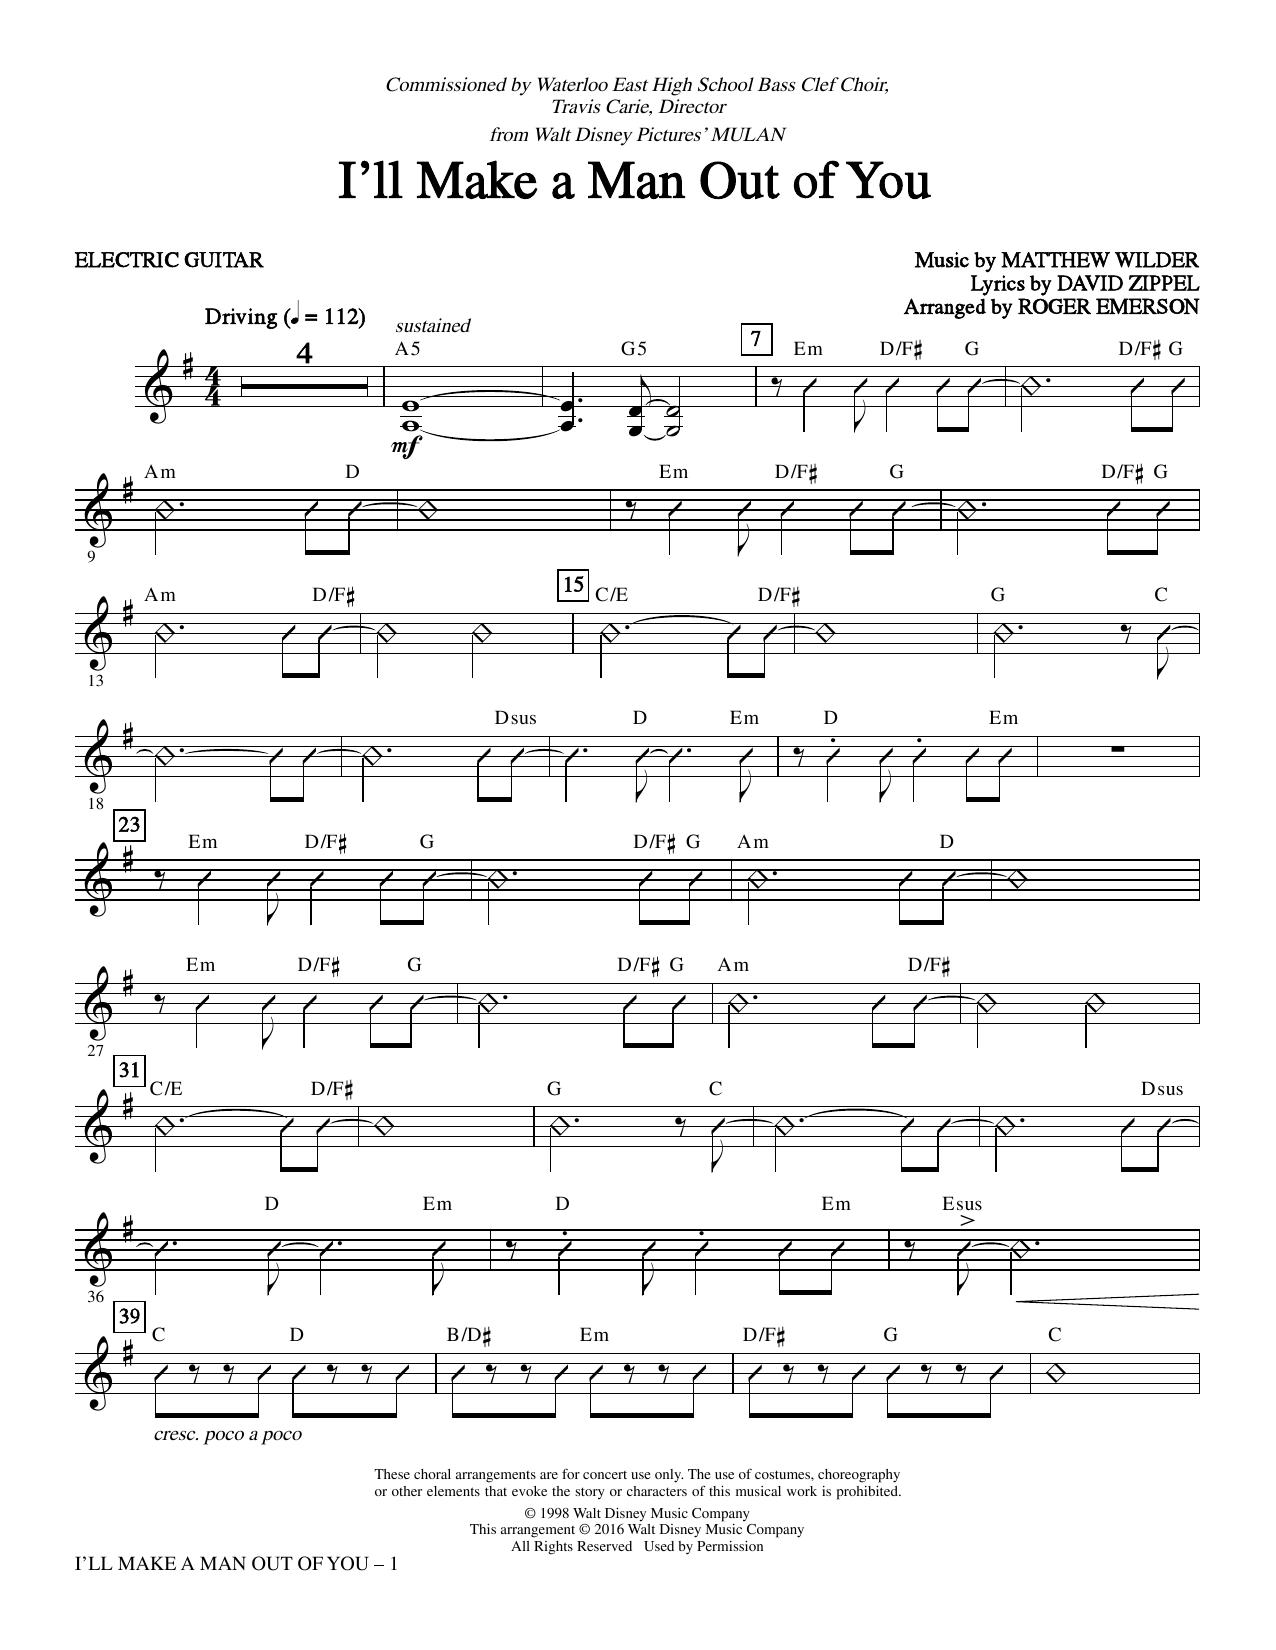 David Zippel 'I'll Make a Man out of You from Mulan arr. Roger Emerson    Guitar' Sheet Music Notes, Chords   Download Printable Choir Instrumental  ...